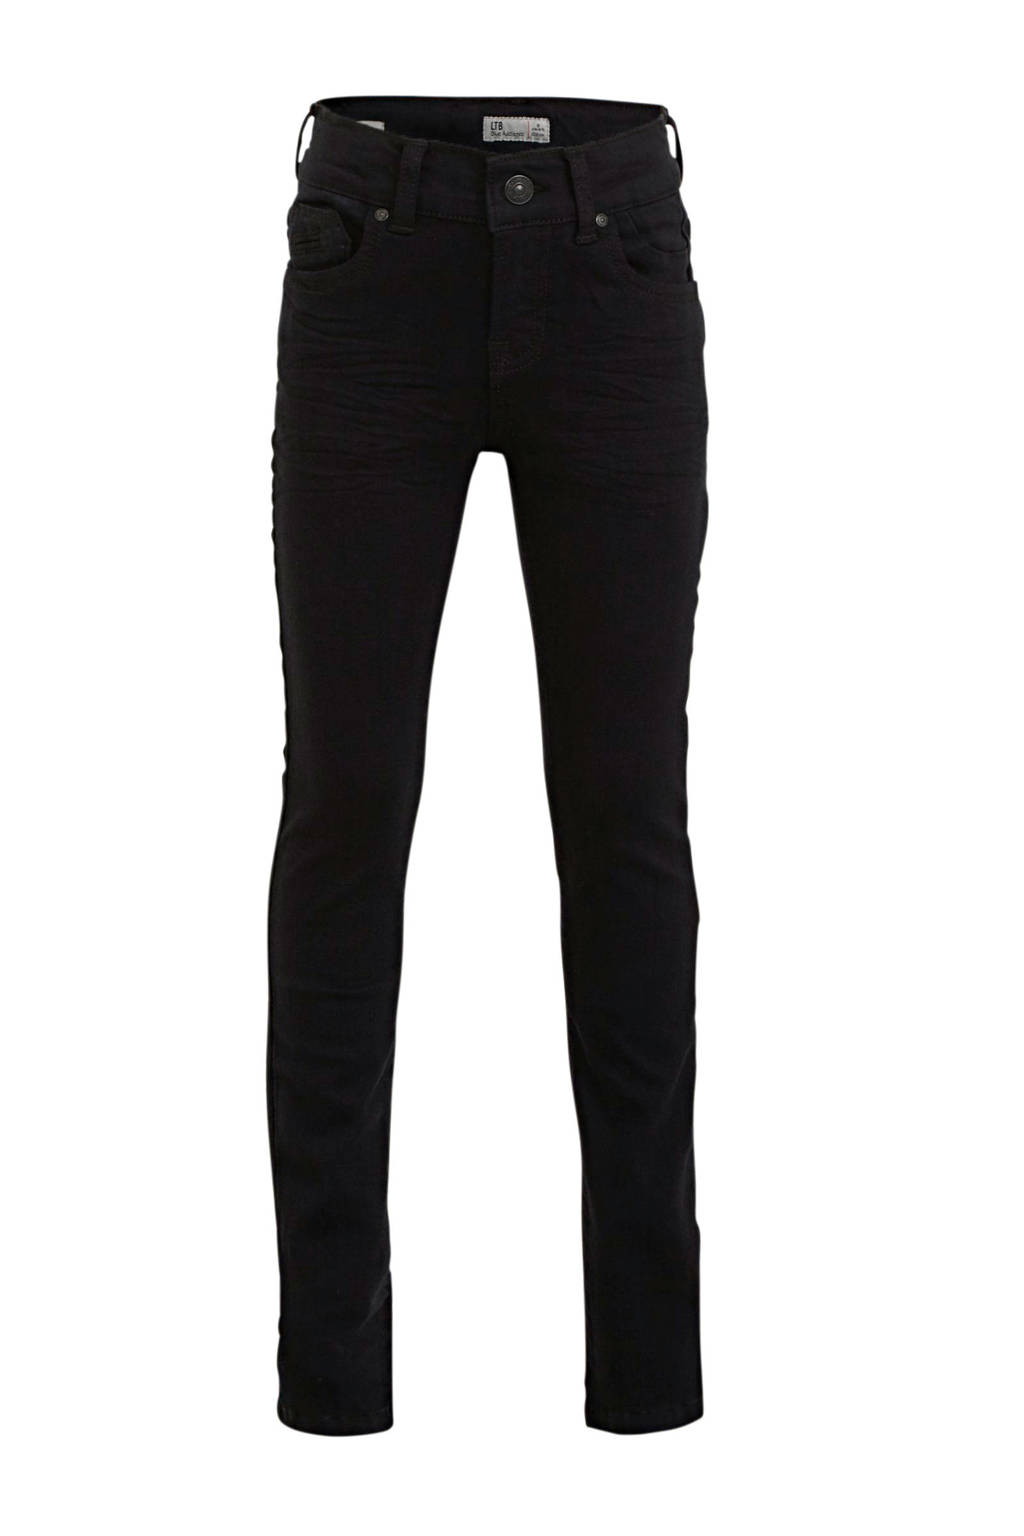 LTB skinny jeans Ravi black wash, BLACK WASH